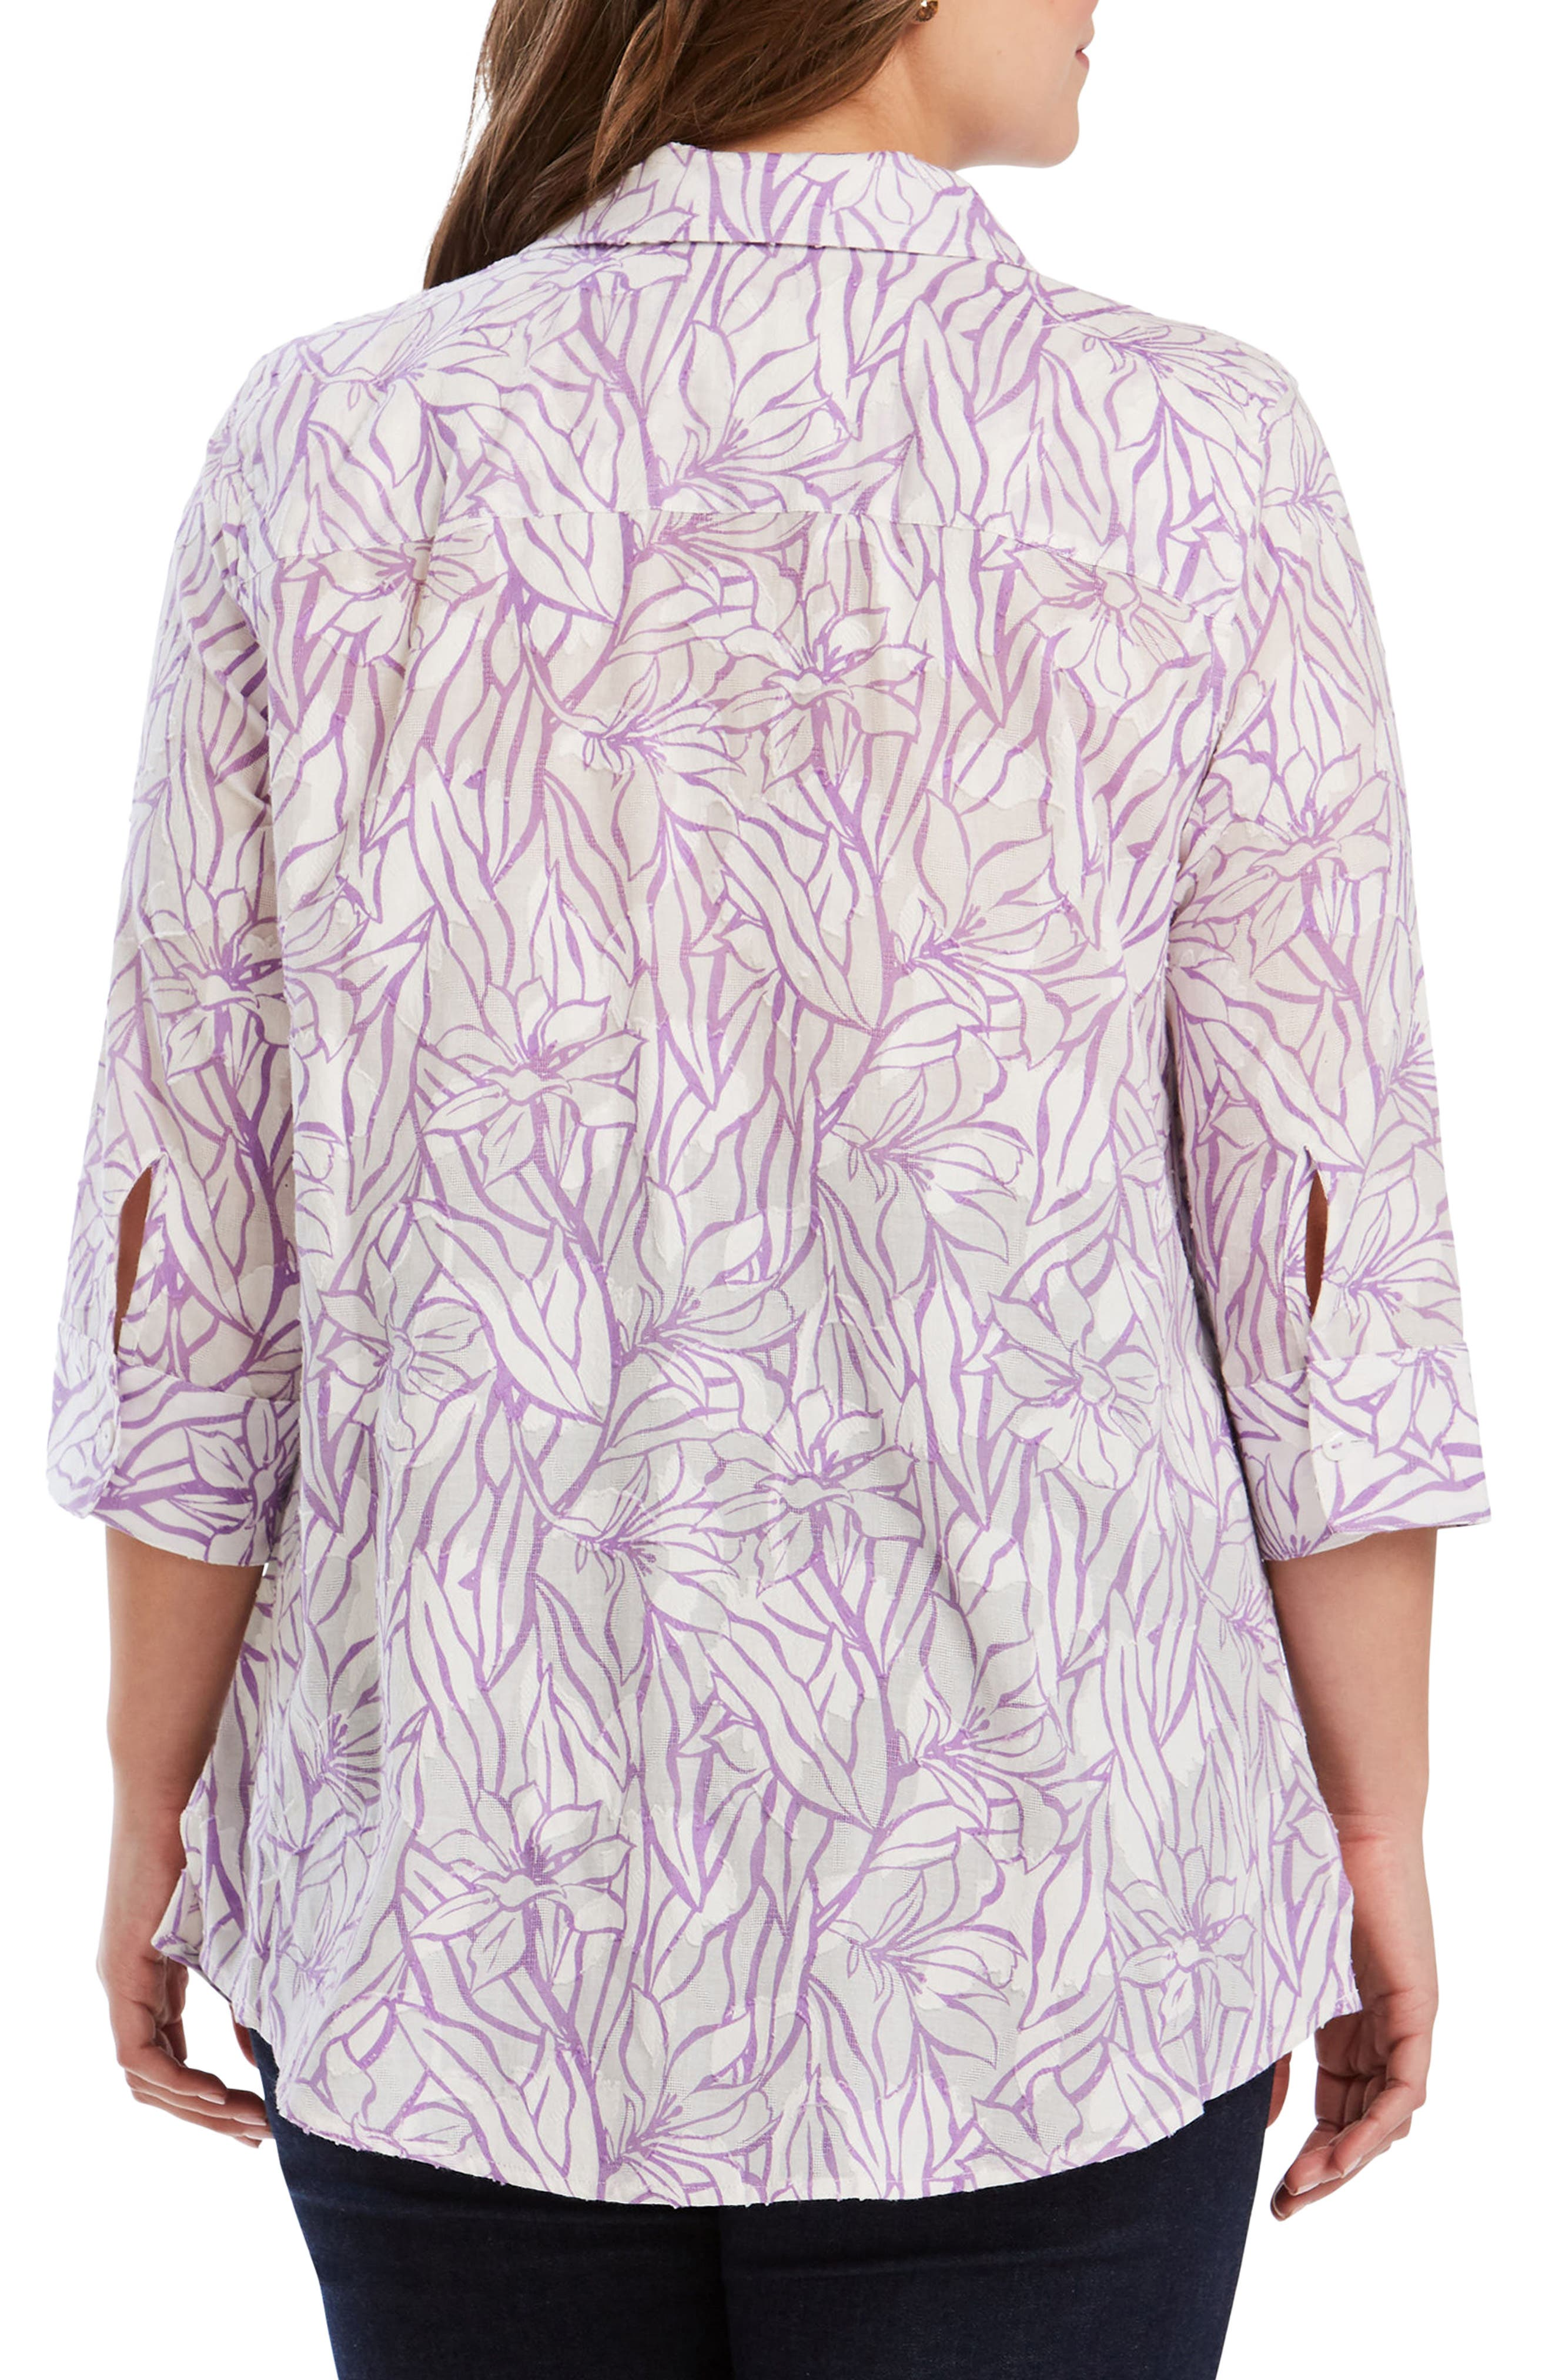 Faith Floral Jacquard Shirt,                             Alternate thumbnail 2, color,                             530